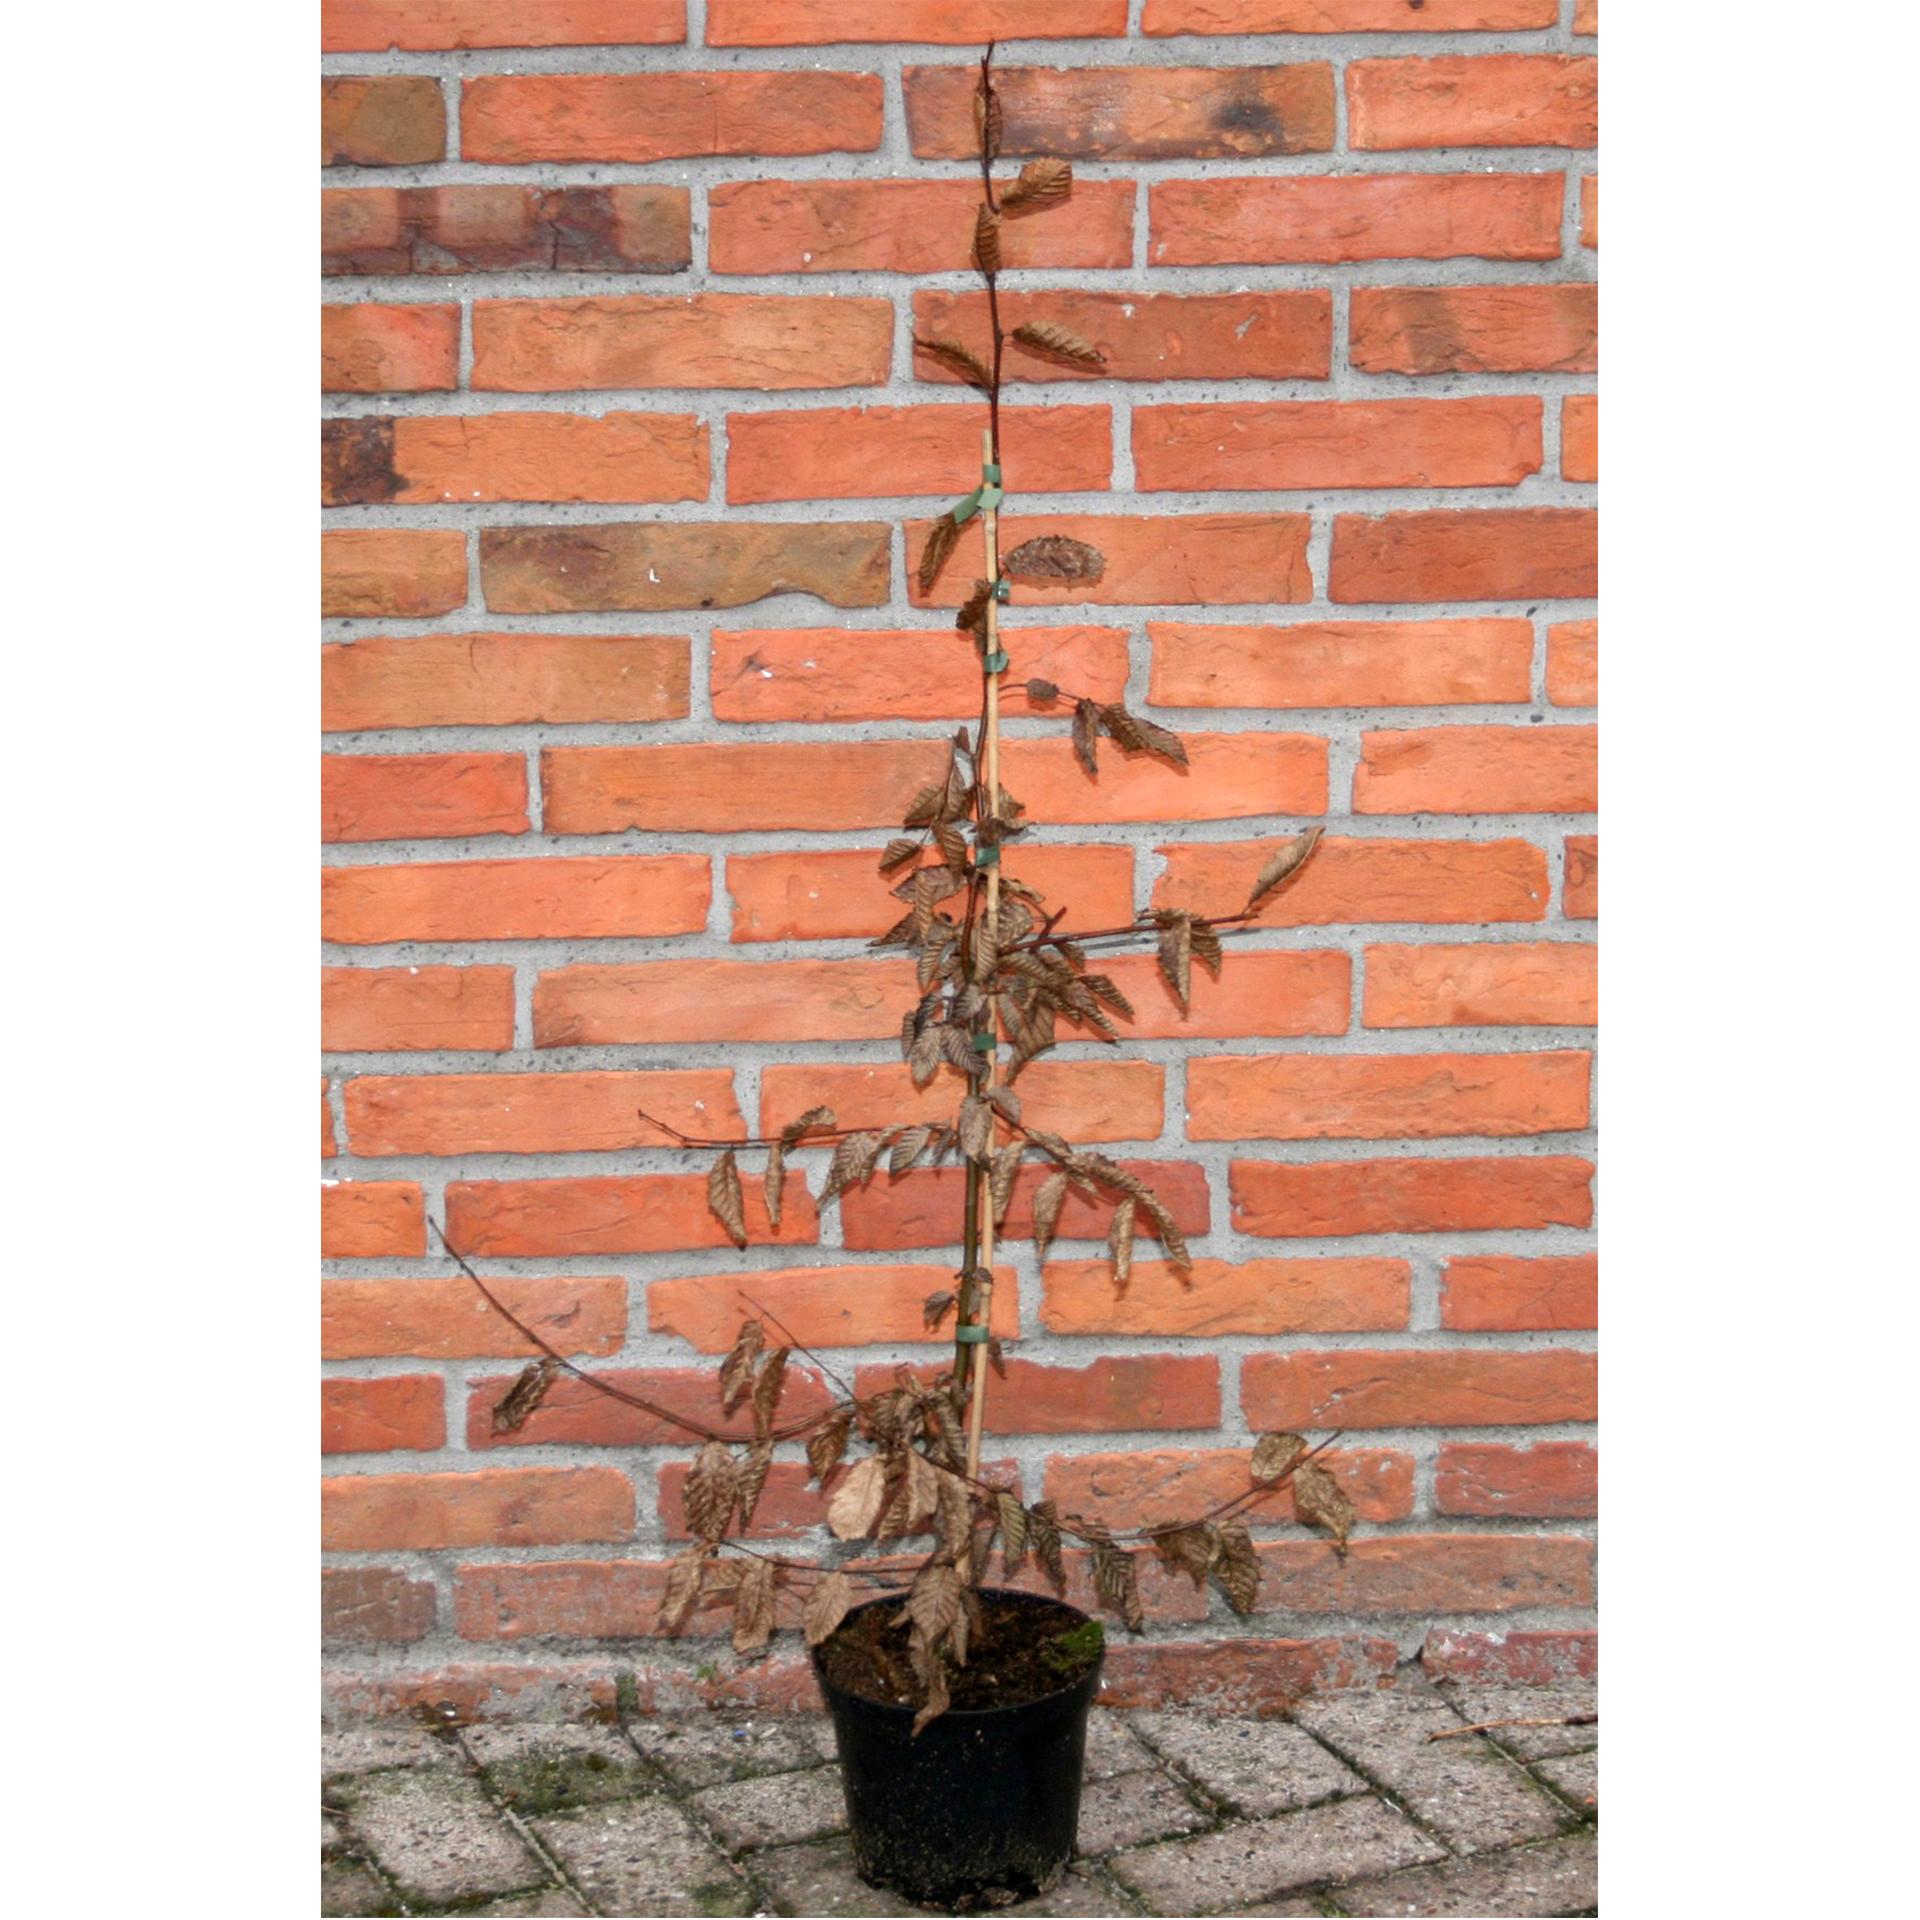 Hainbuche - Carpinus betulus, 60-100cm